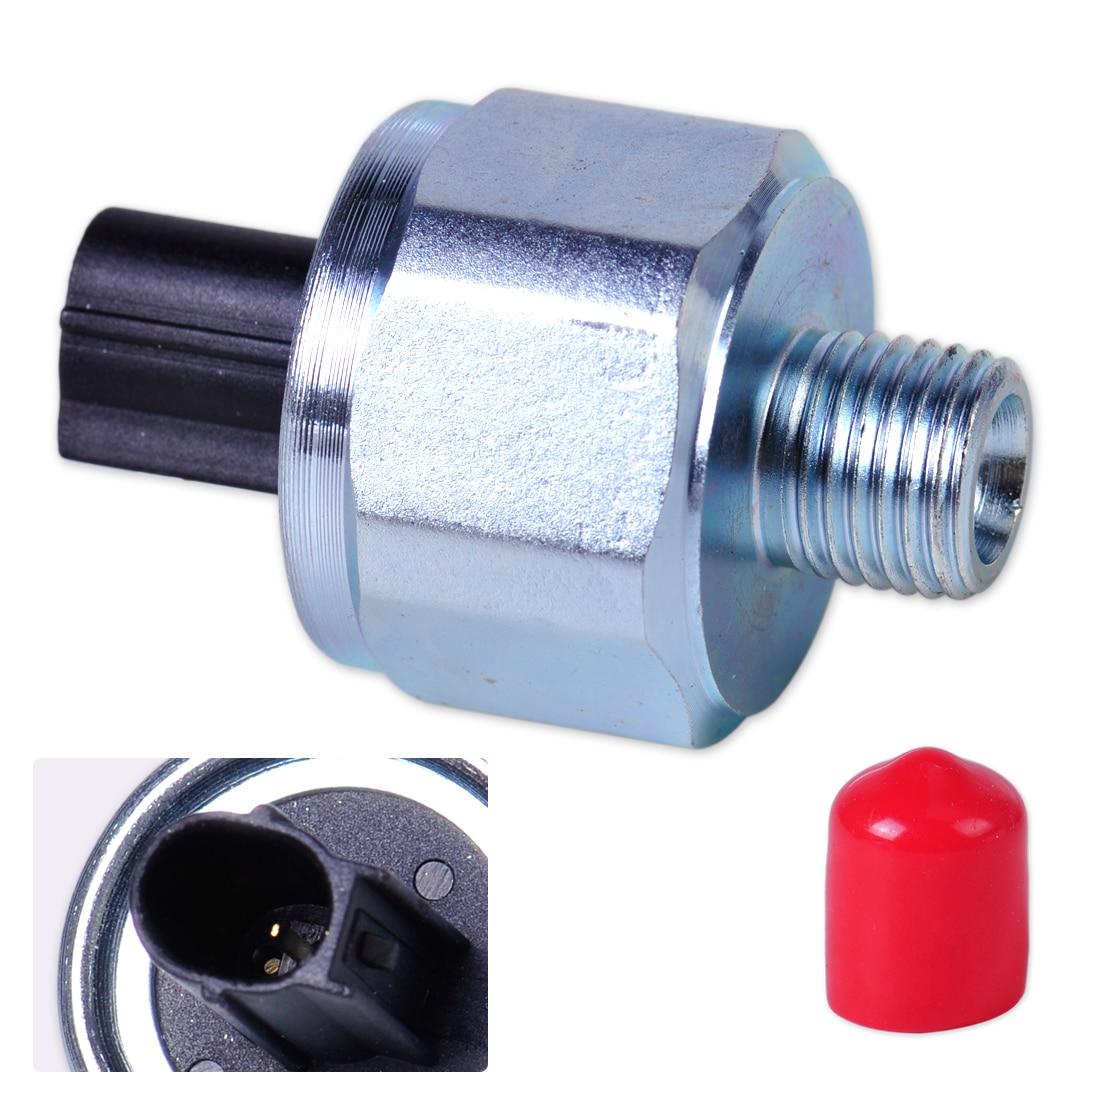 ACURA  fits 30530-PPL-A01 30530-PNA-003 Knock Sensor  Civic CR-V Genuine HONDA